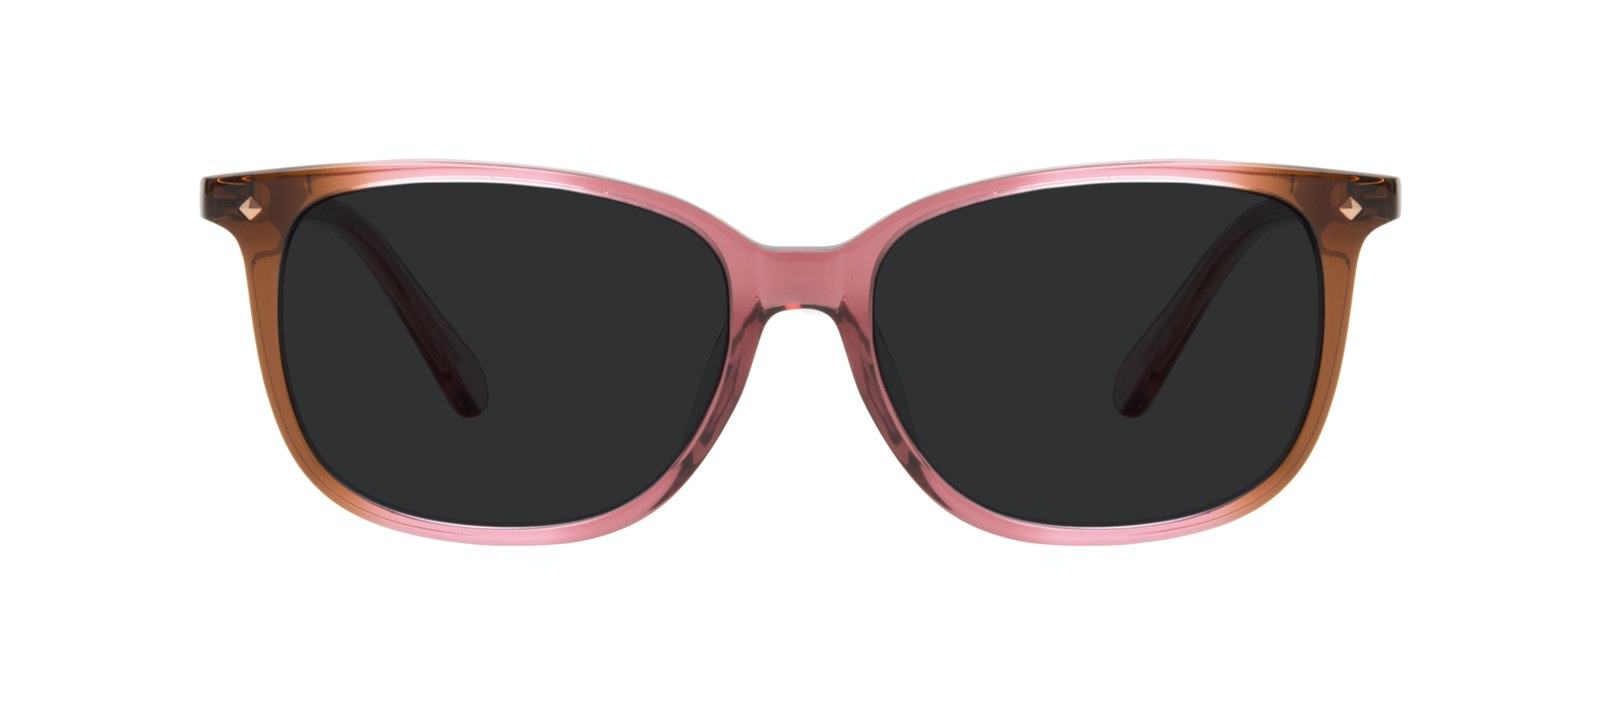 Affordable Fashion Glasses Square Sunglasses Women Refine Petite Garnet Front